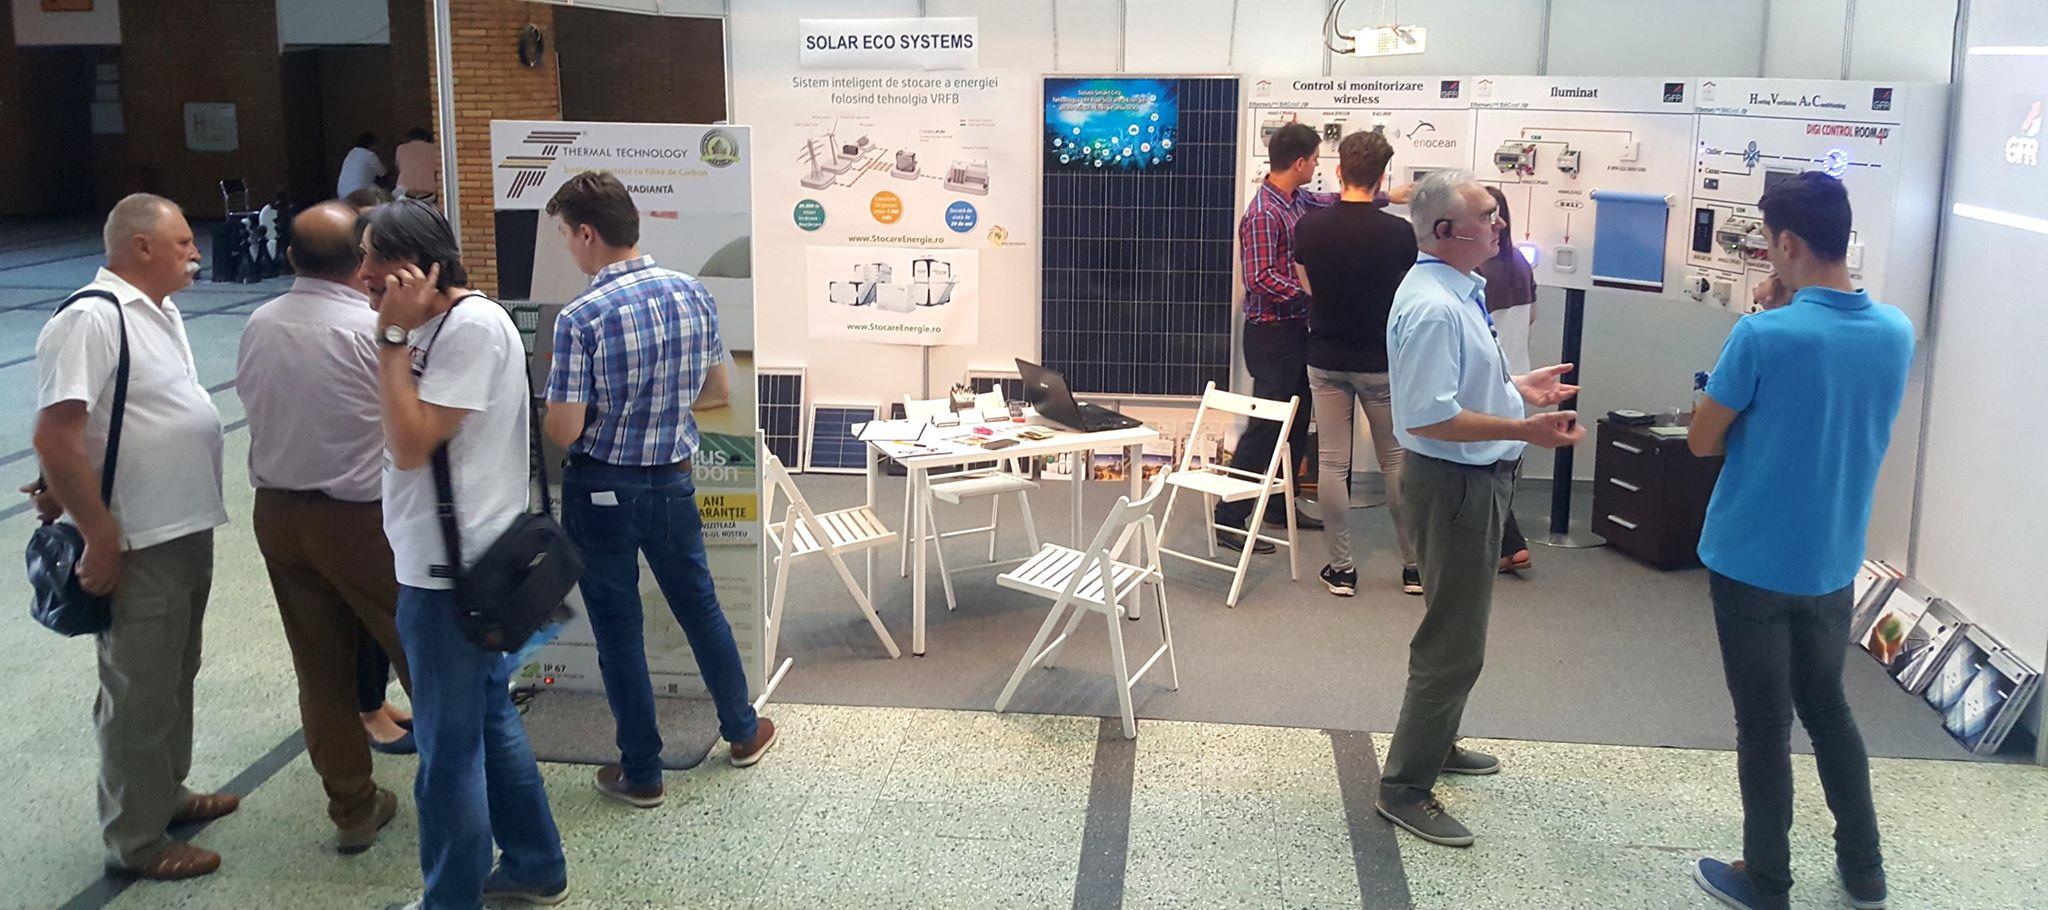 Solar Eco Systems RoEnergy - Targ de Energii si Eficienta Energetica Bucuresti 2